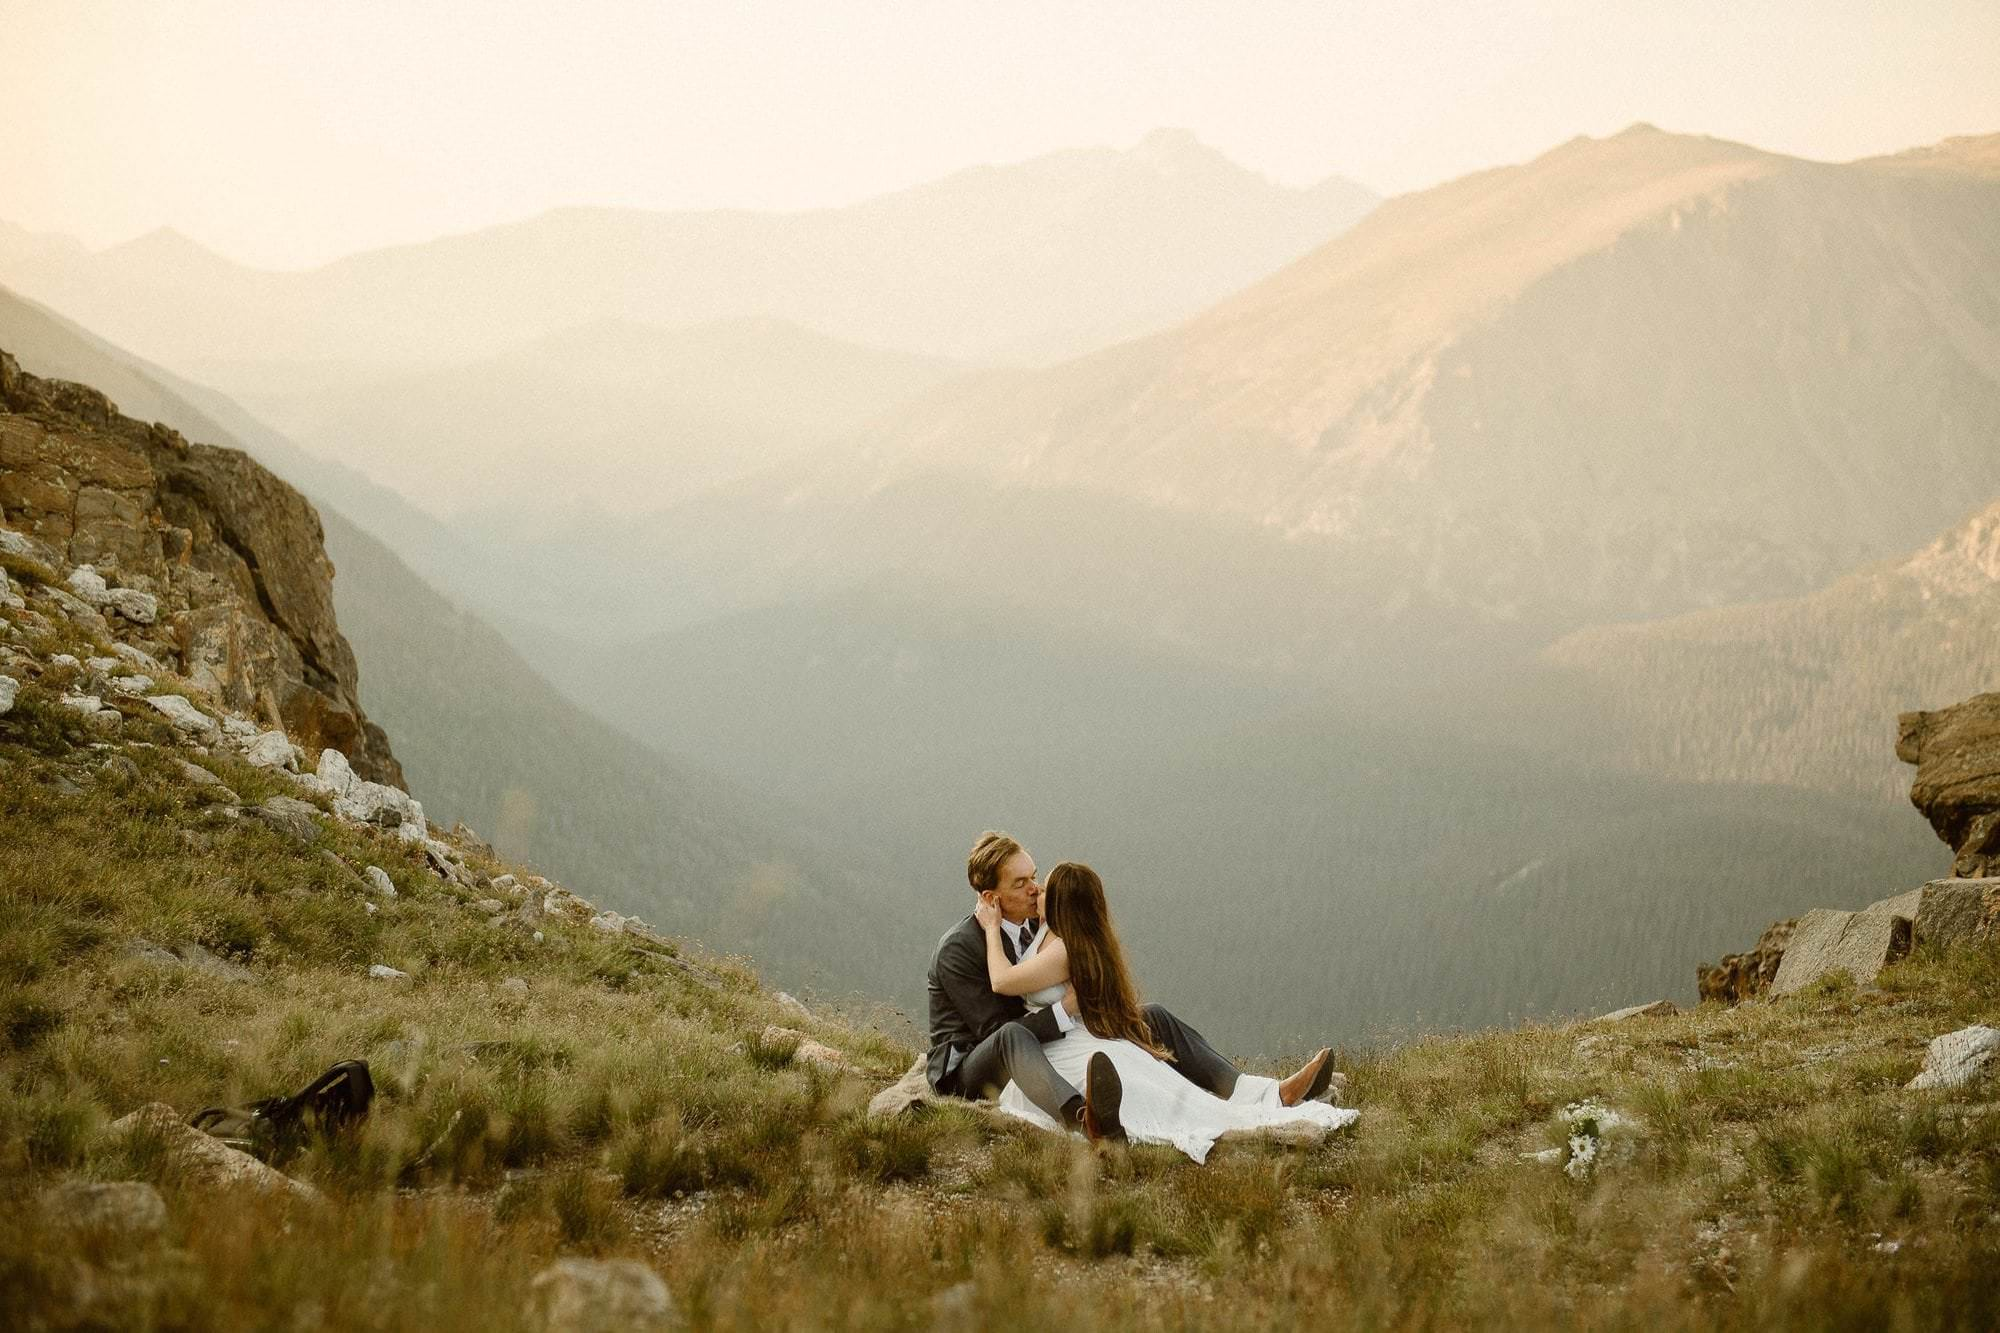 Colorado Sunrise. Colorado Intimate Weddings and Adventure Elopement Photographer | Rocky Mountain National Park Wedding Photographer | Adventure